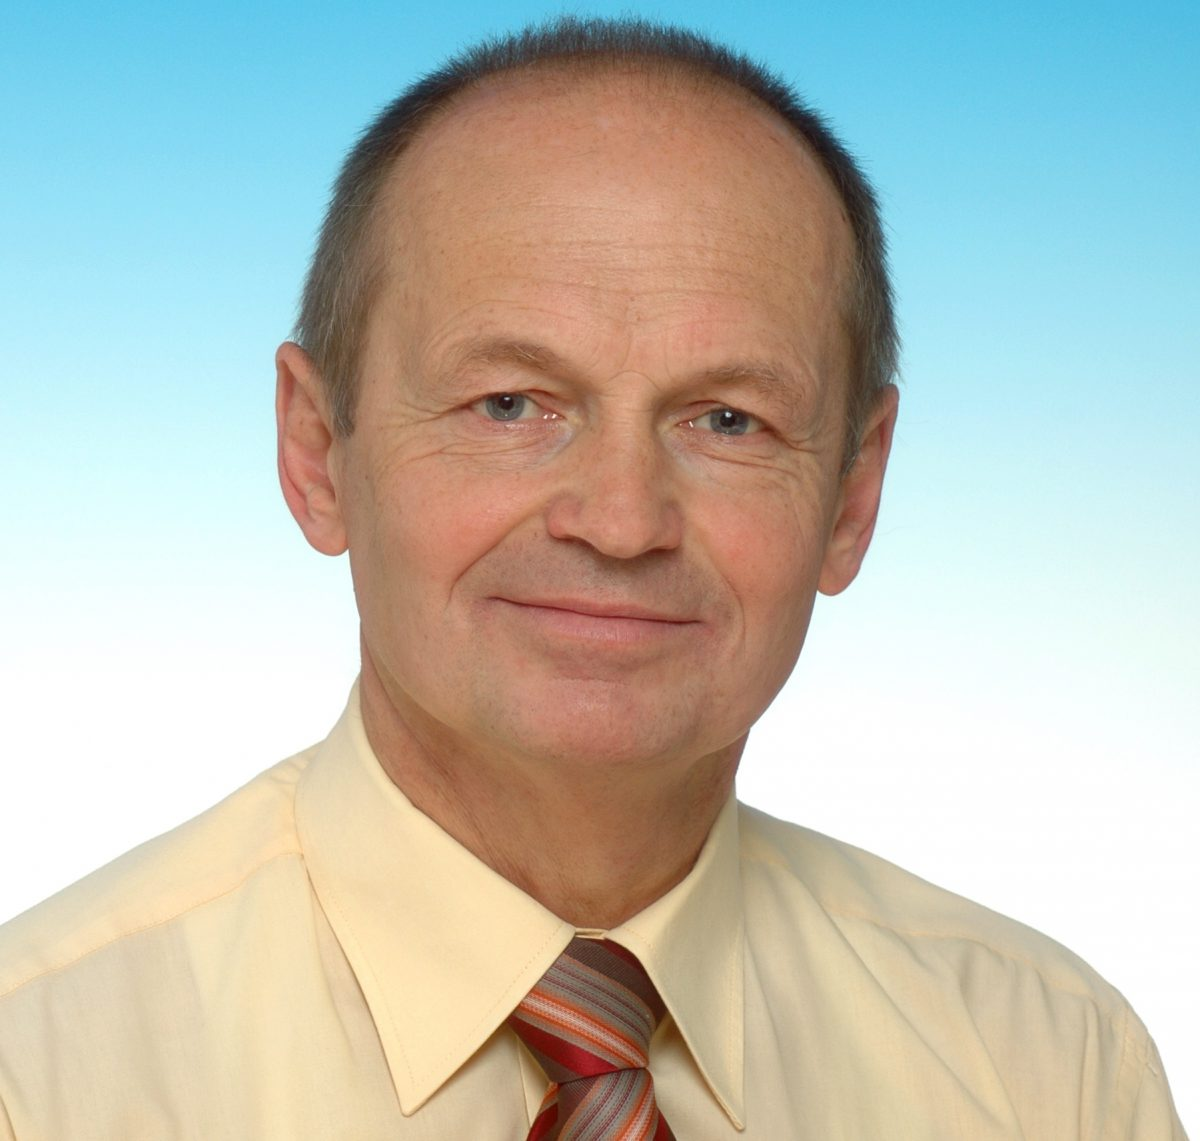 Petr Olša